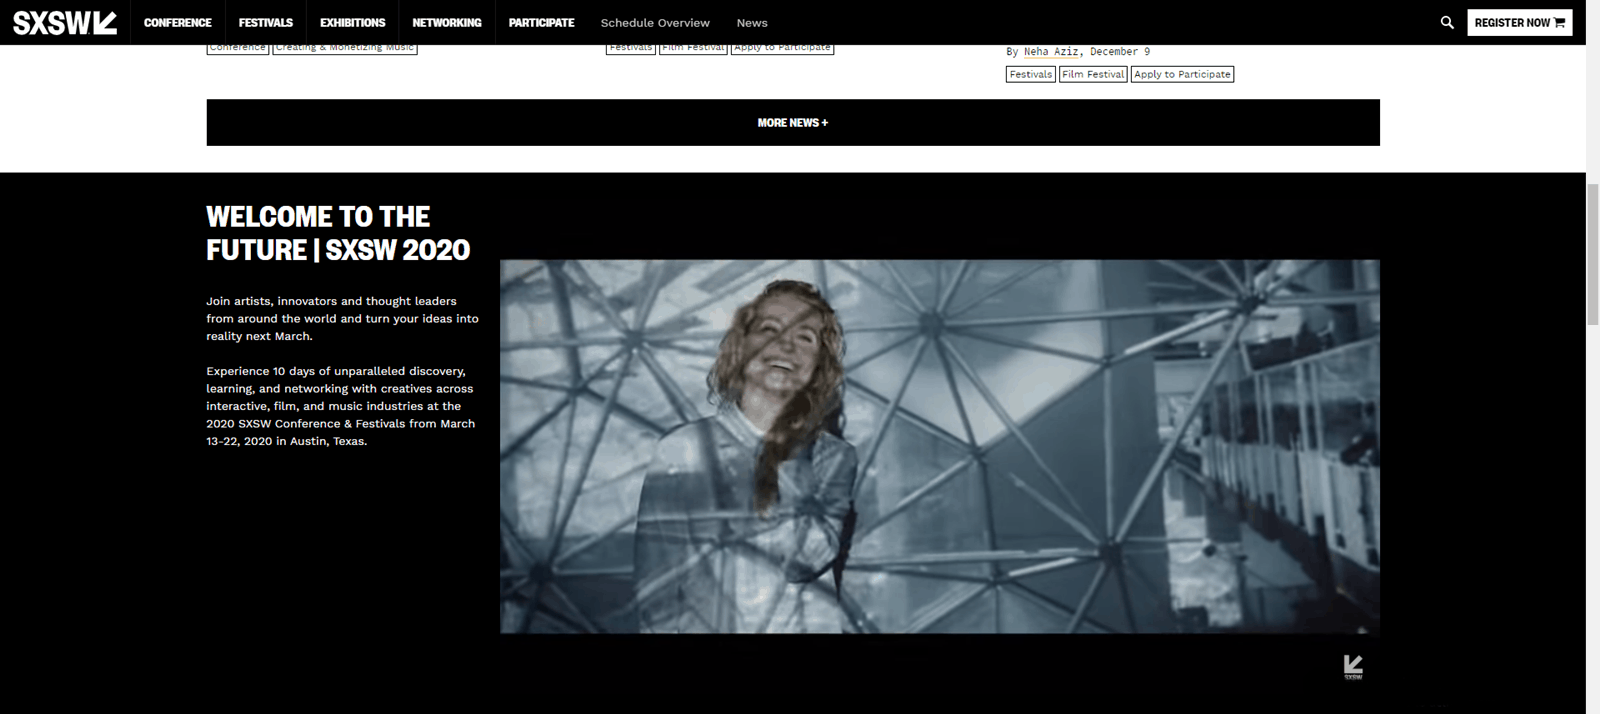 sxsw video landing page